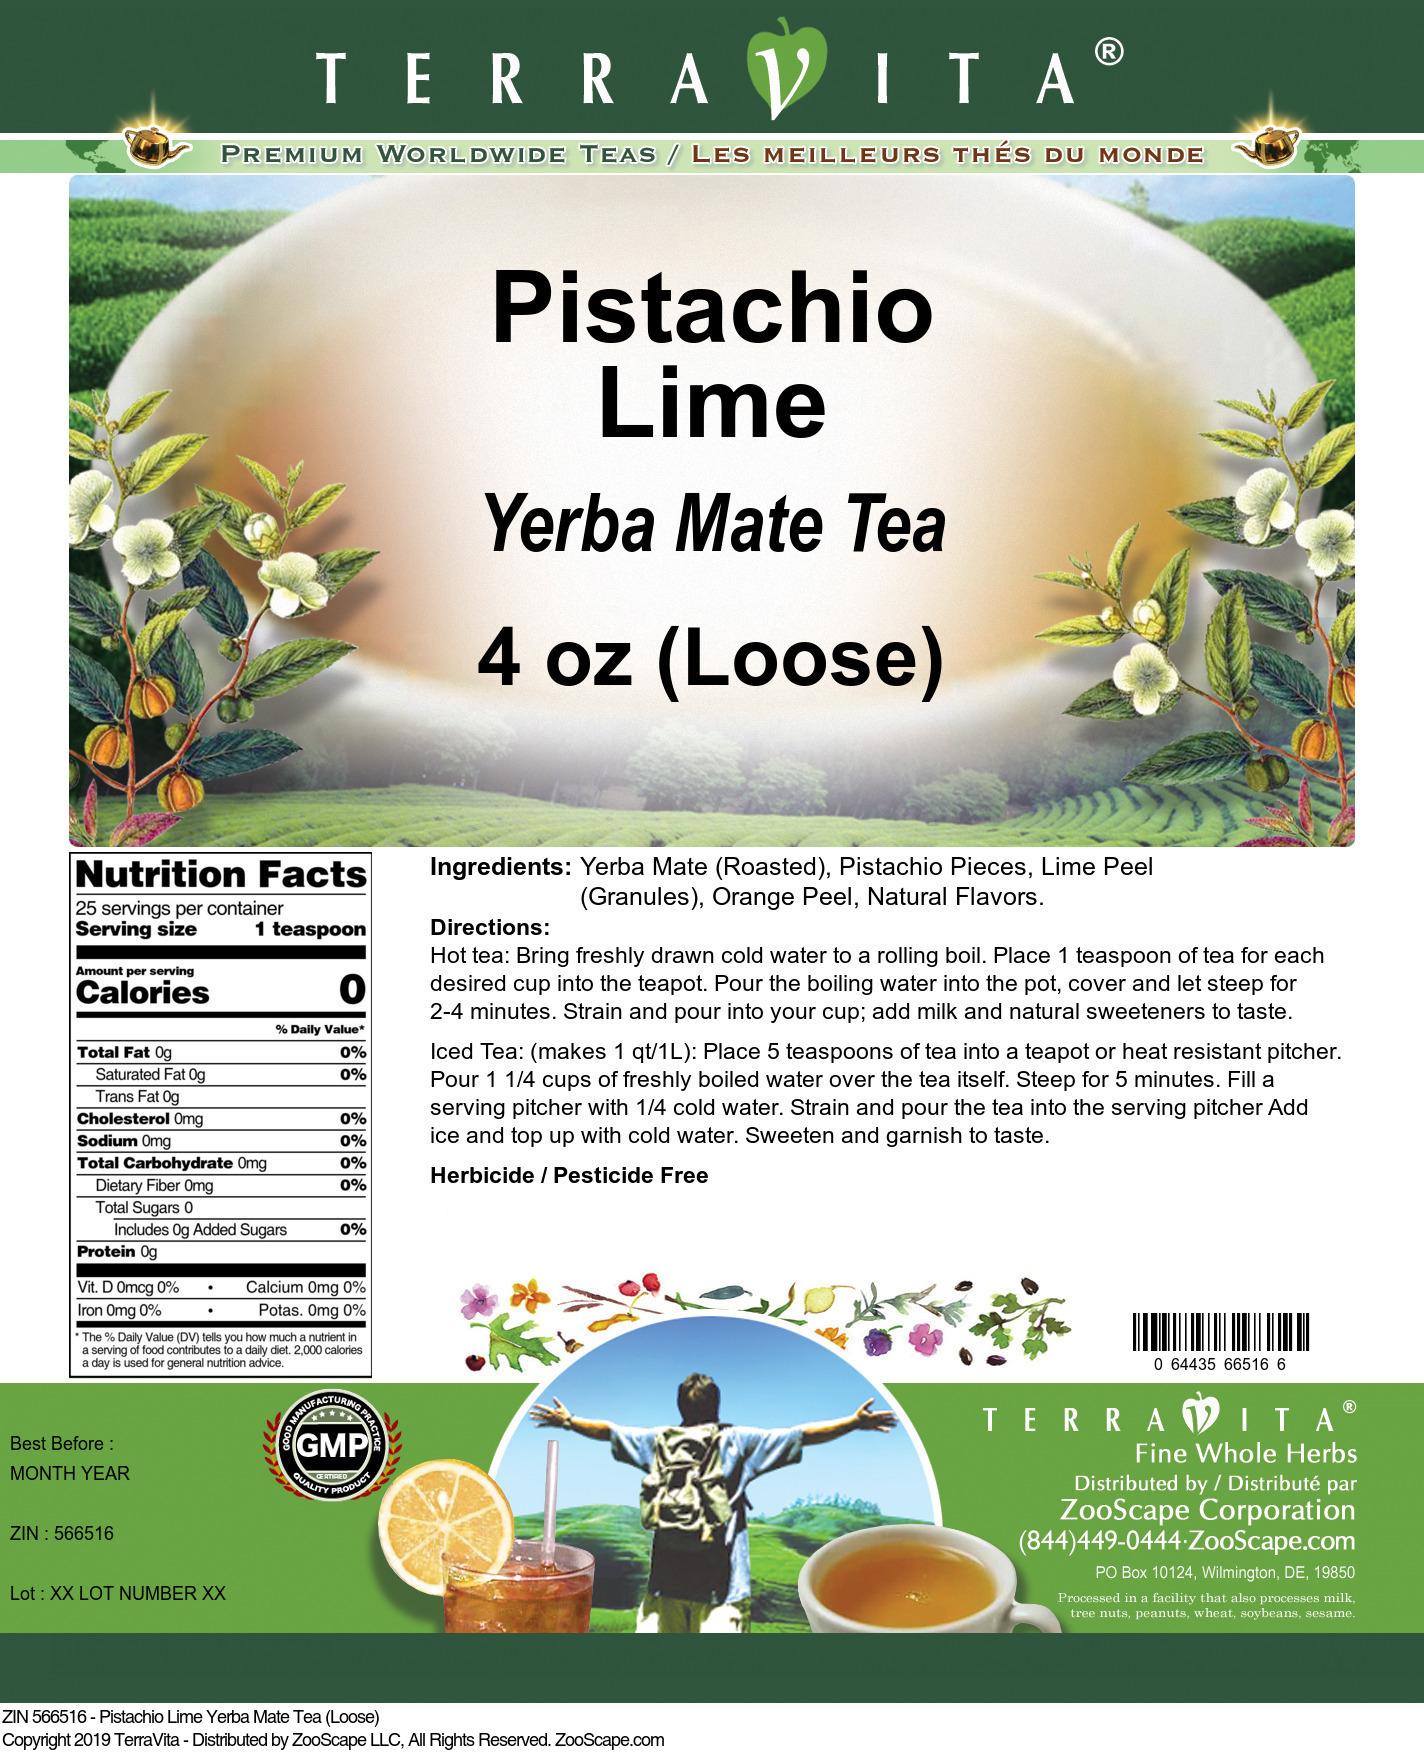 Pistachio Lime Yerba Mate